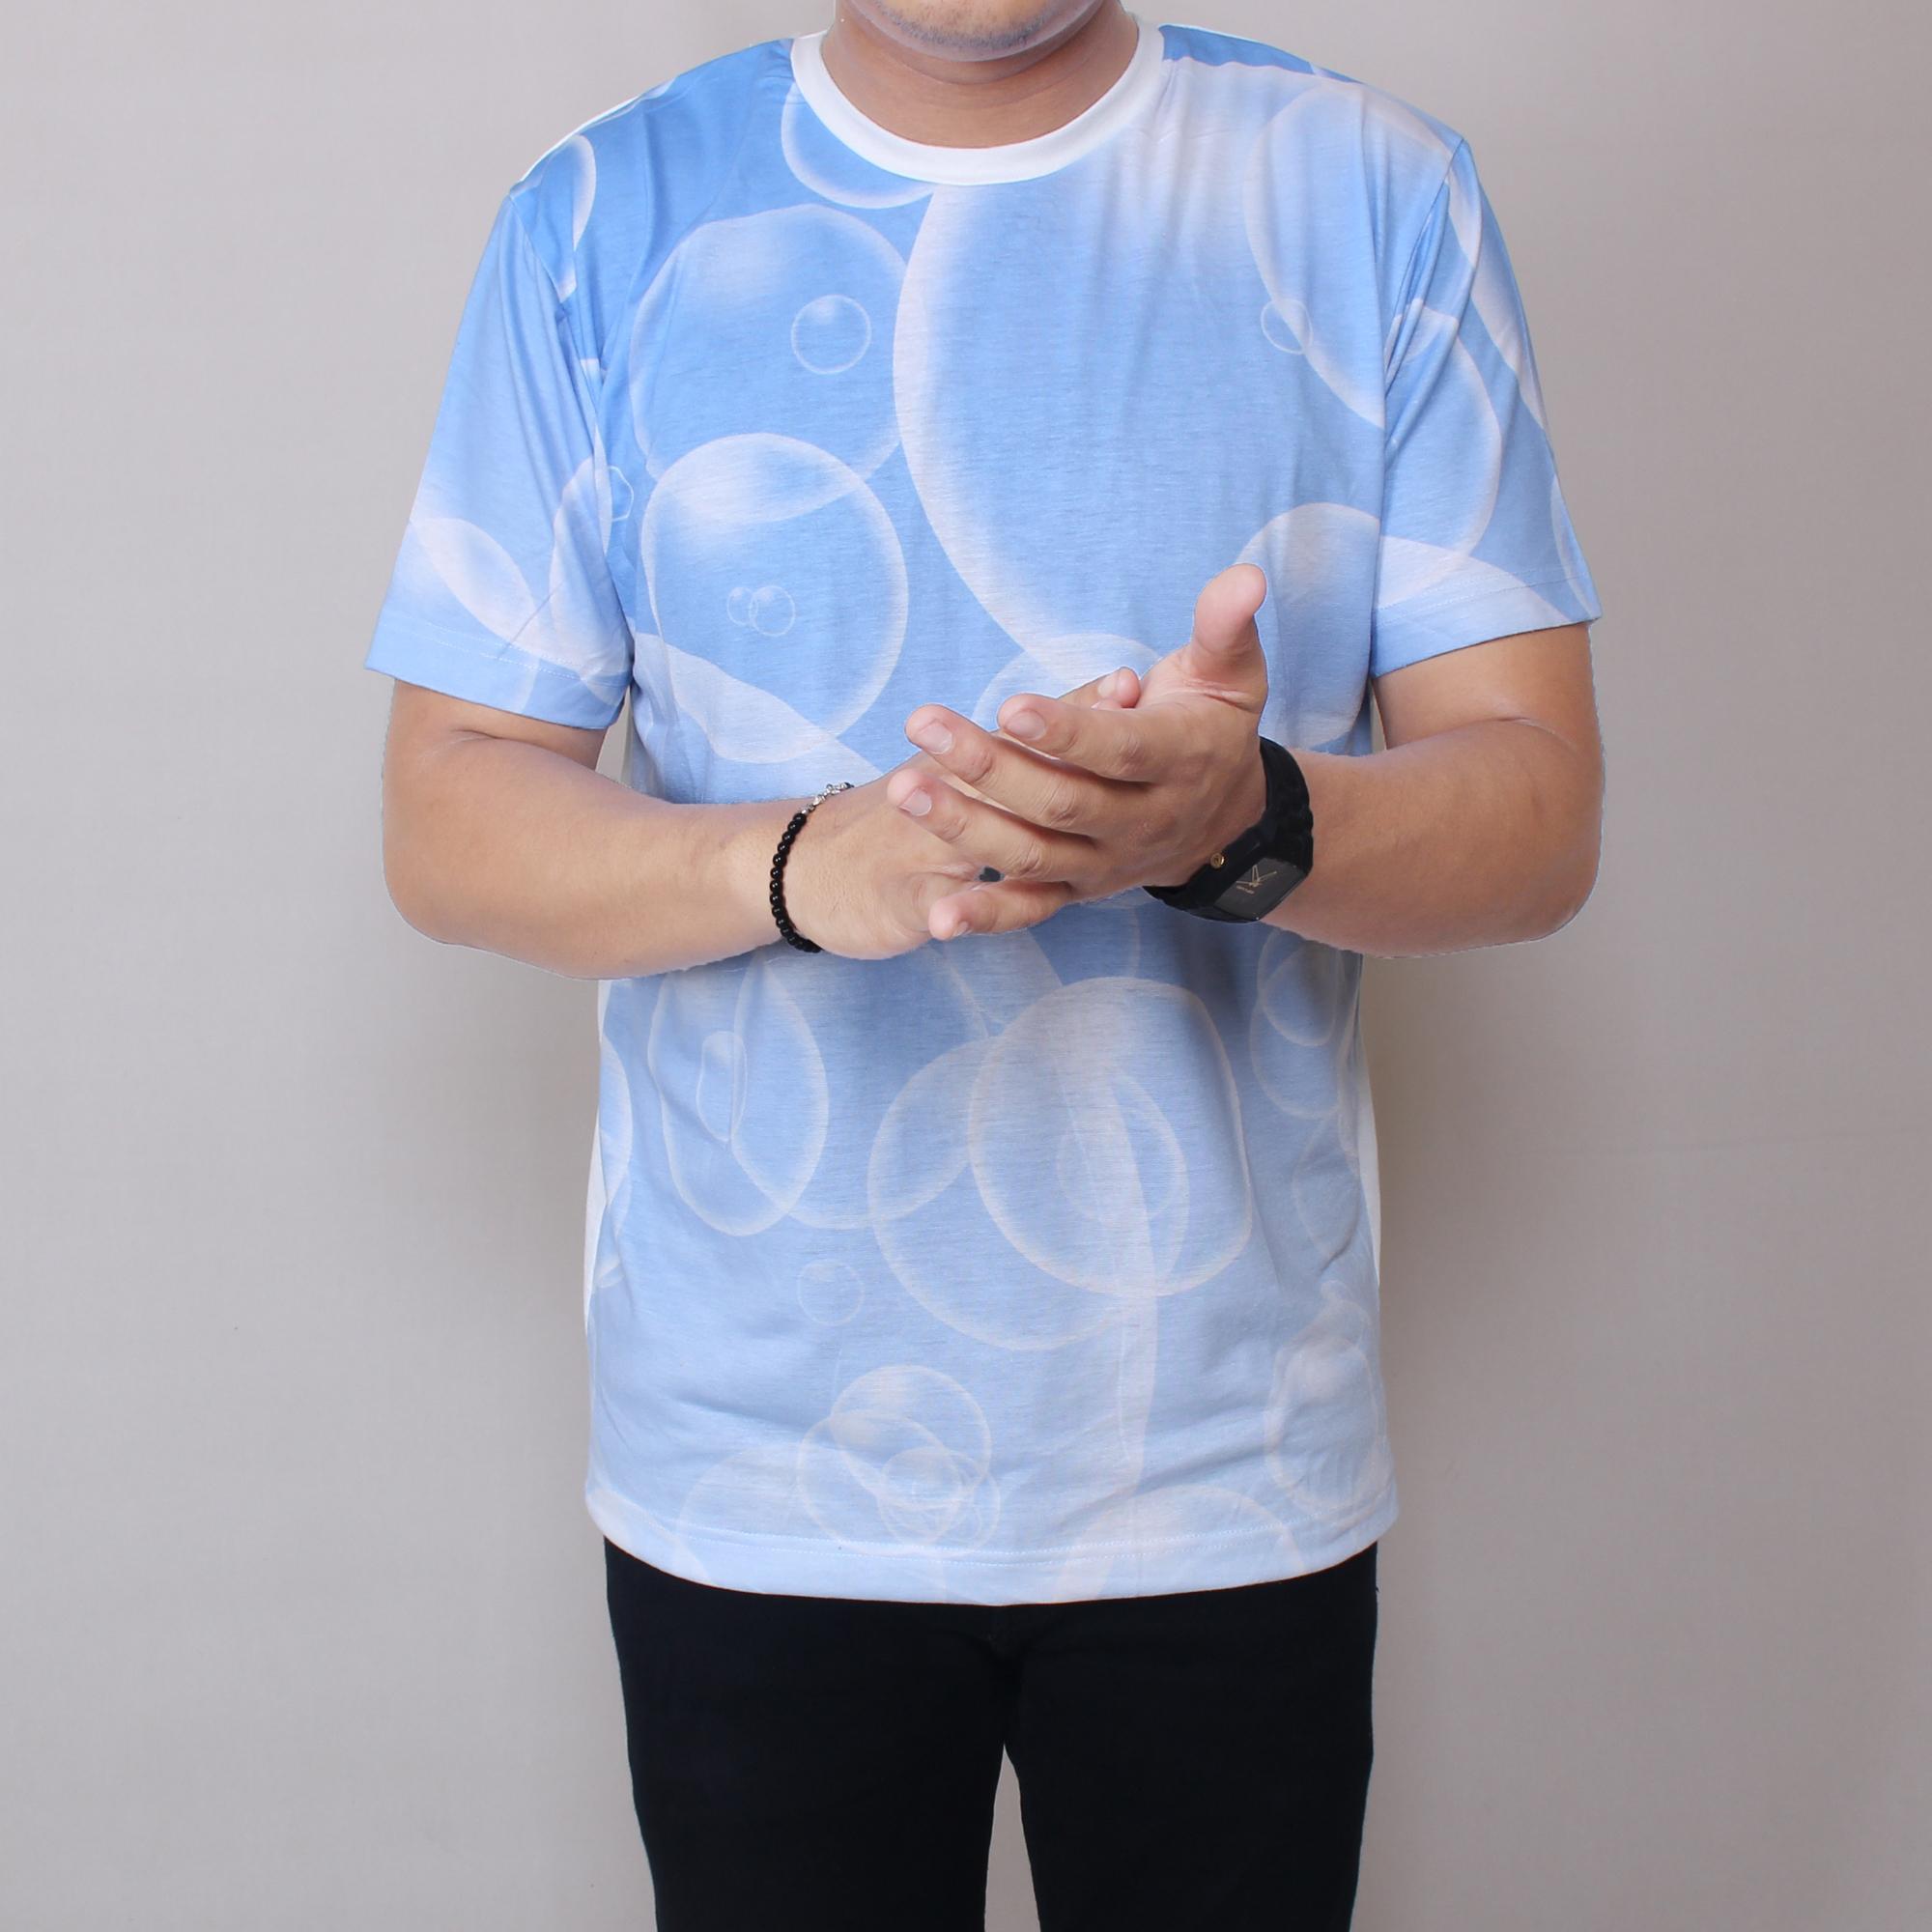 Zoeystore1 5984 Kaos Putih Motif BALON Pria Lengan Pendek Baju Kaos Distro Casual